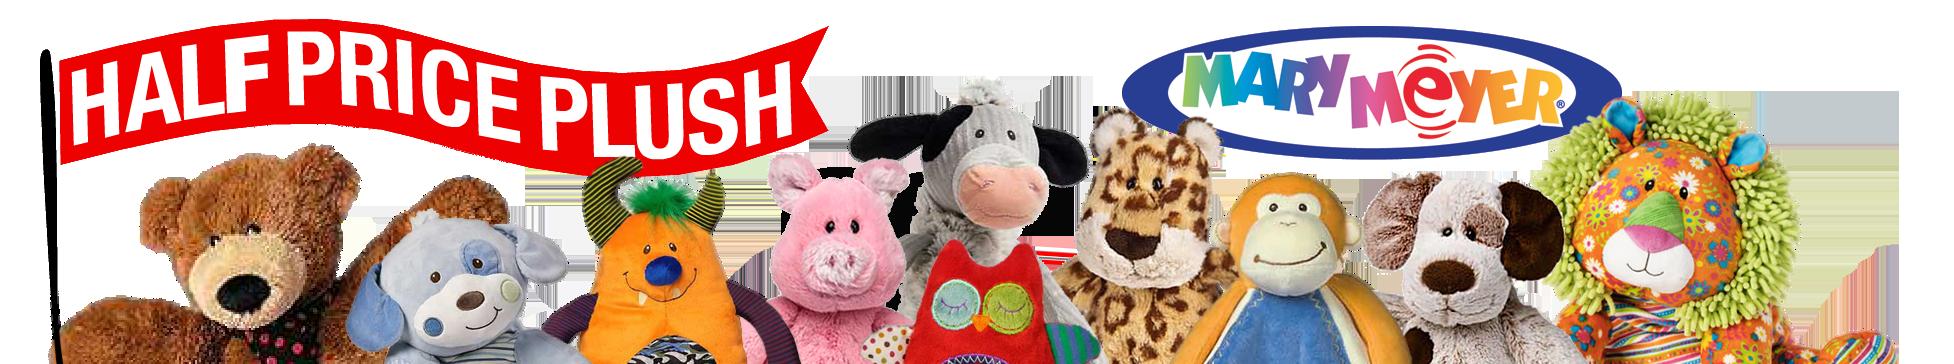 Wholesale stuffed animals at big discounts